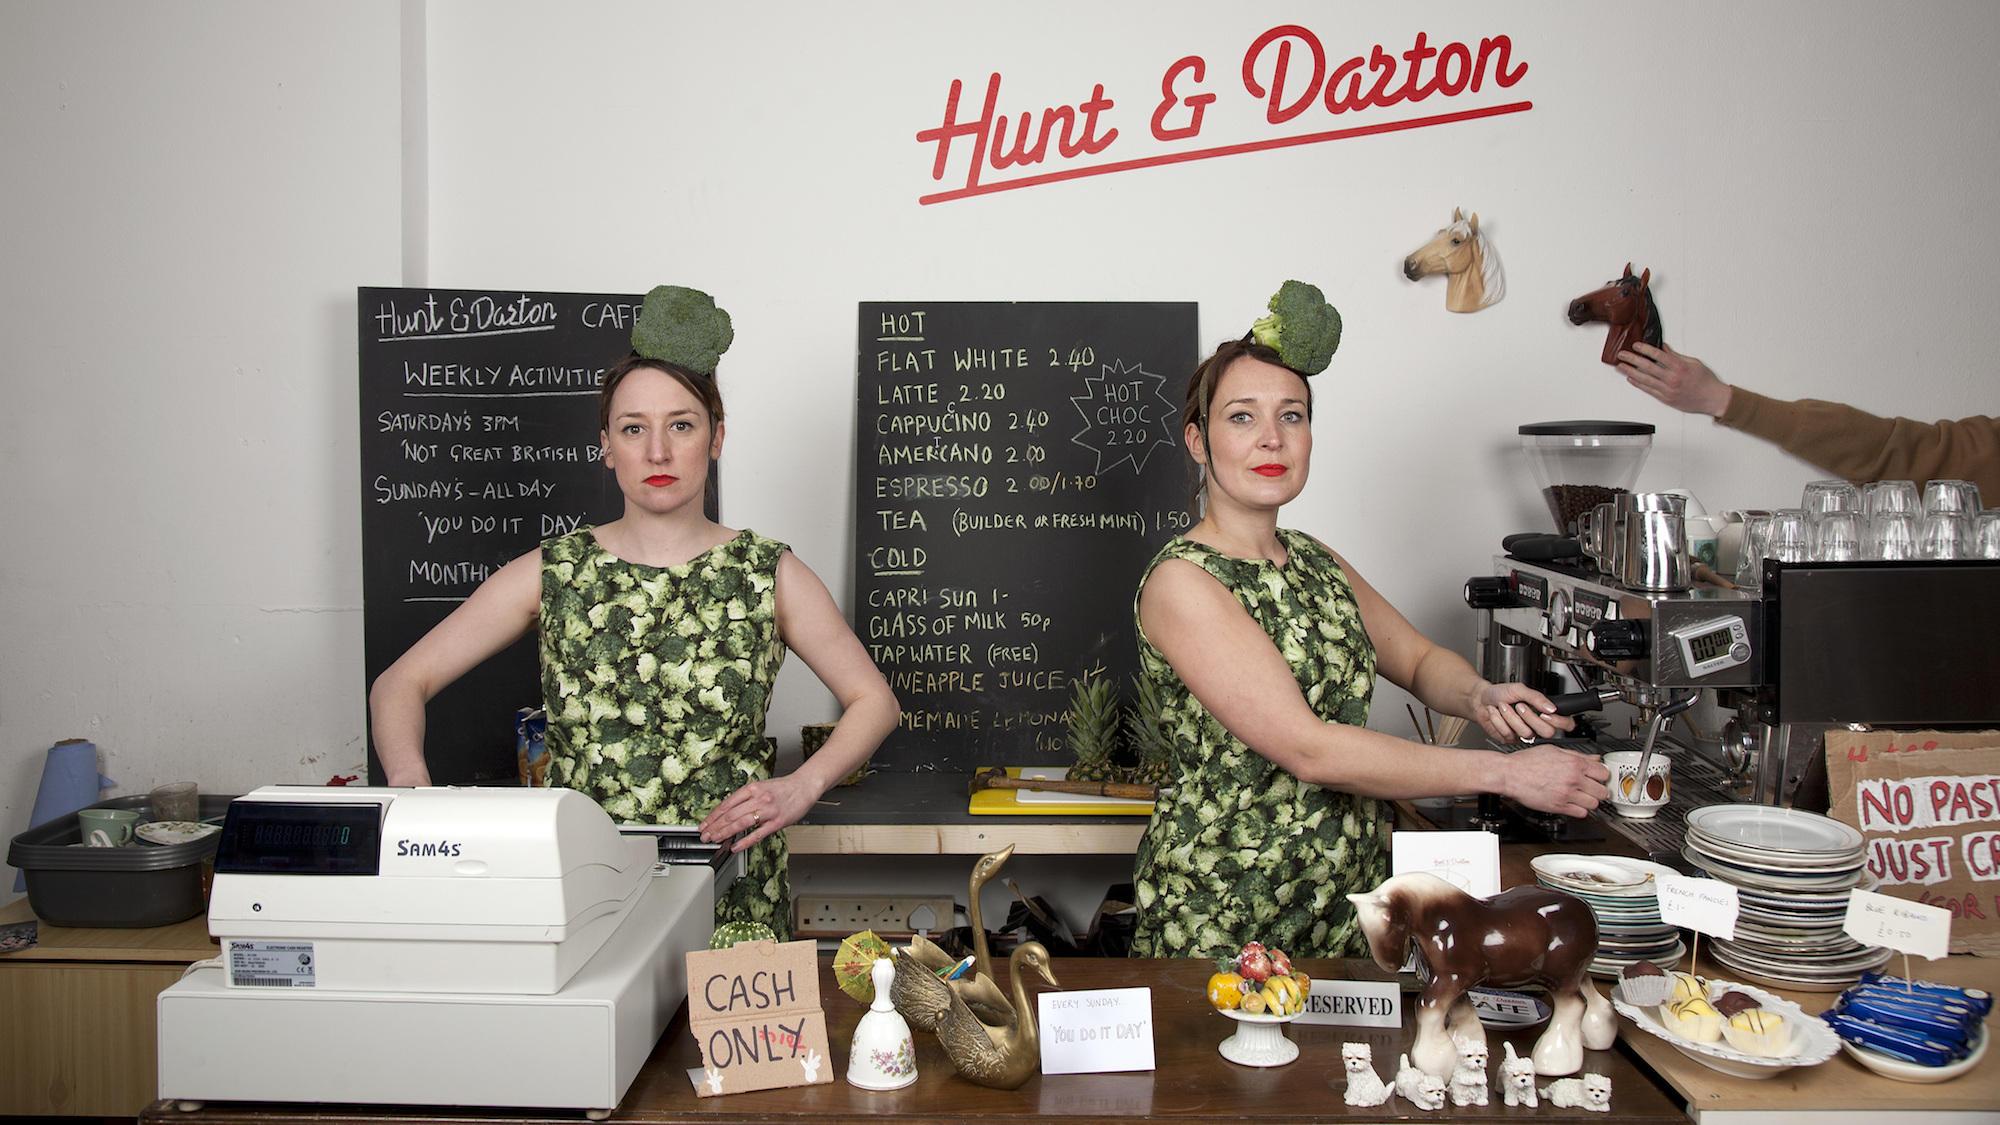 Hunt & Darton - H&D Café © Christa Holka